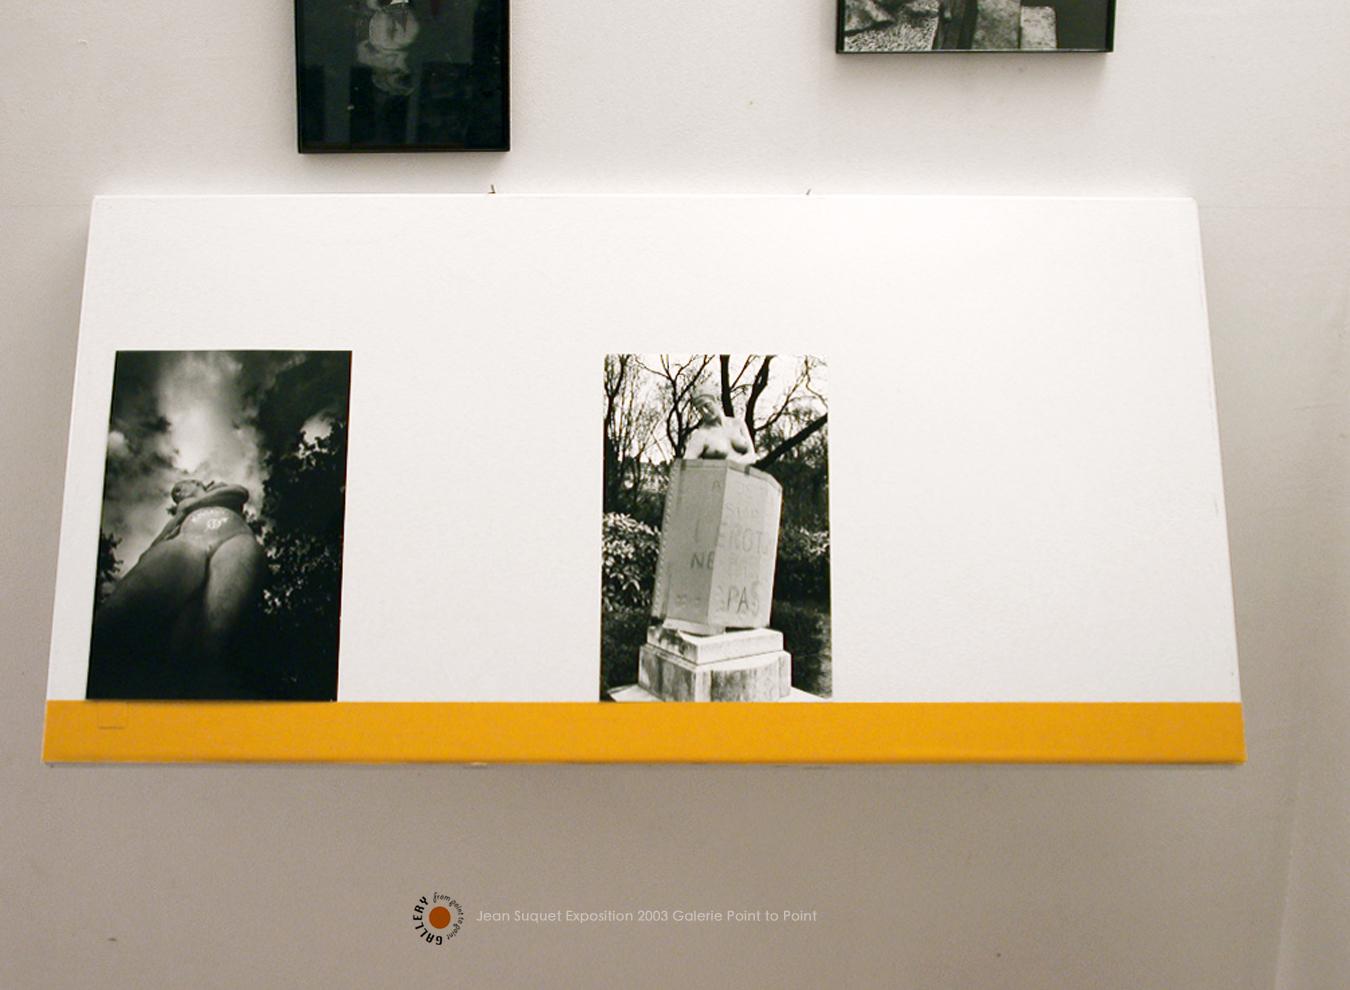 Vue-Nord-Exposition-Photographies-Jean-Suquet